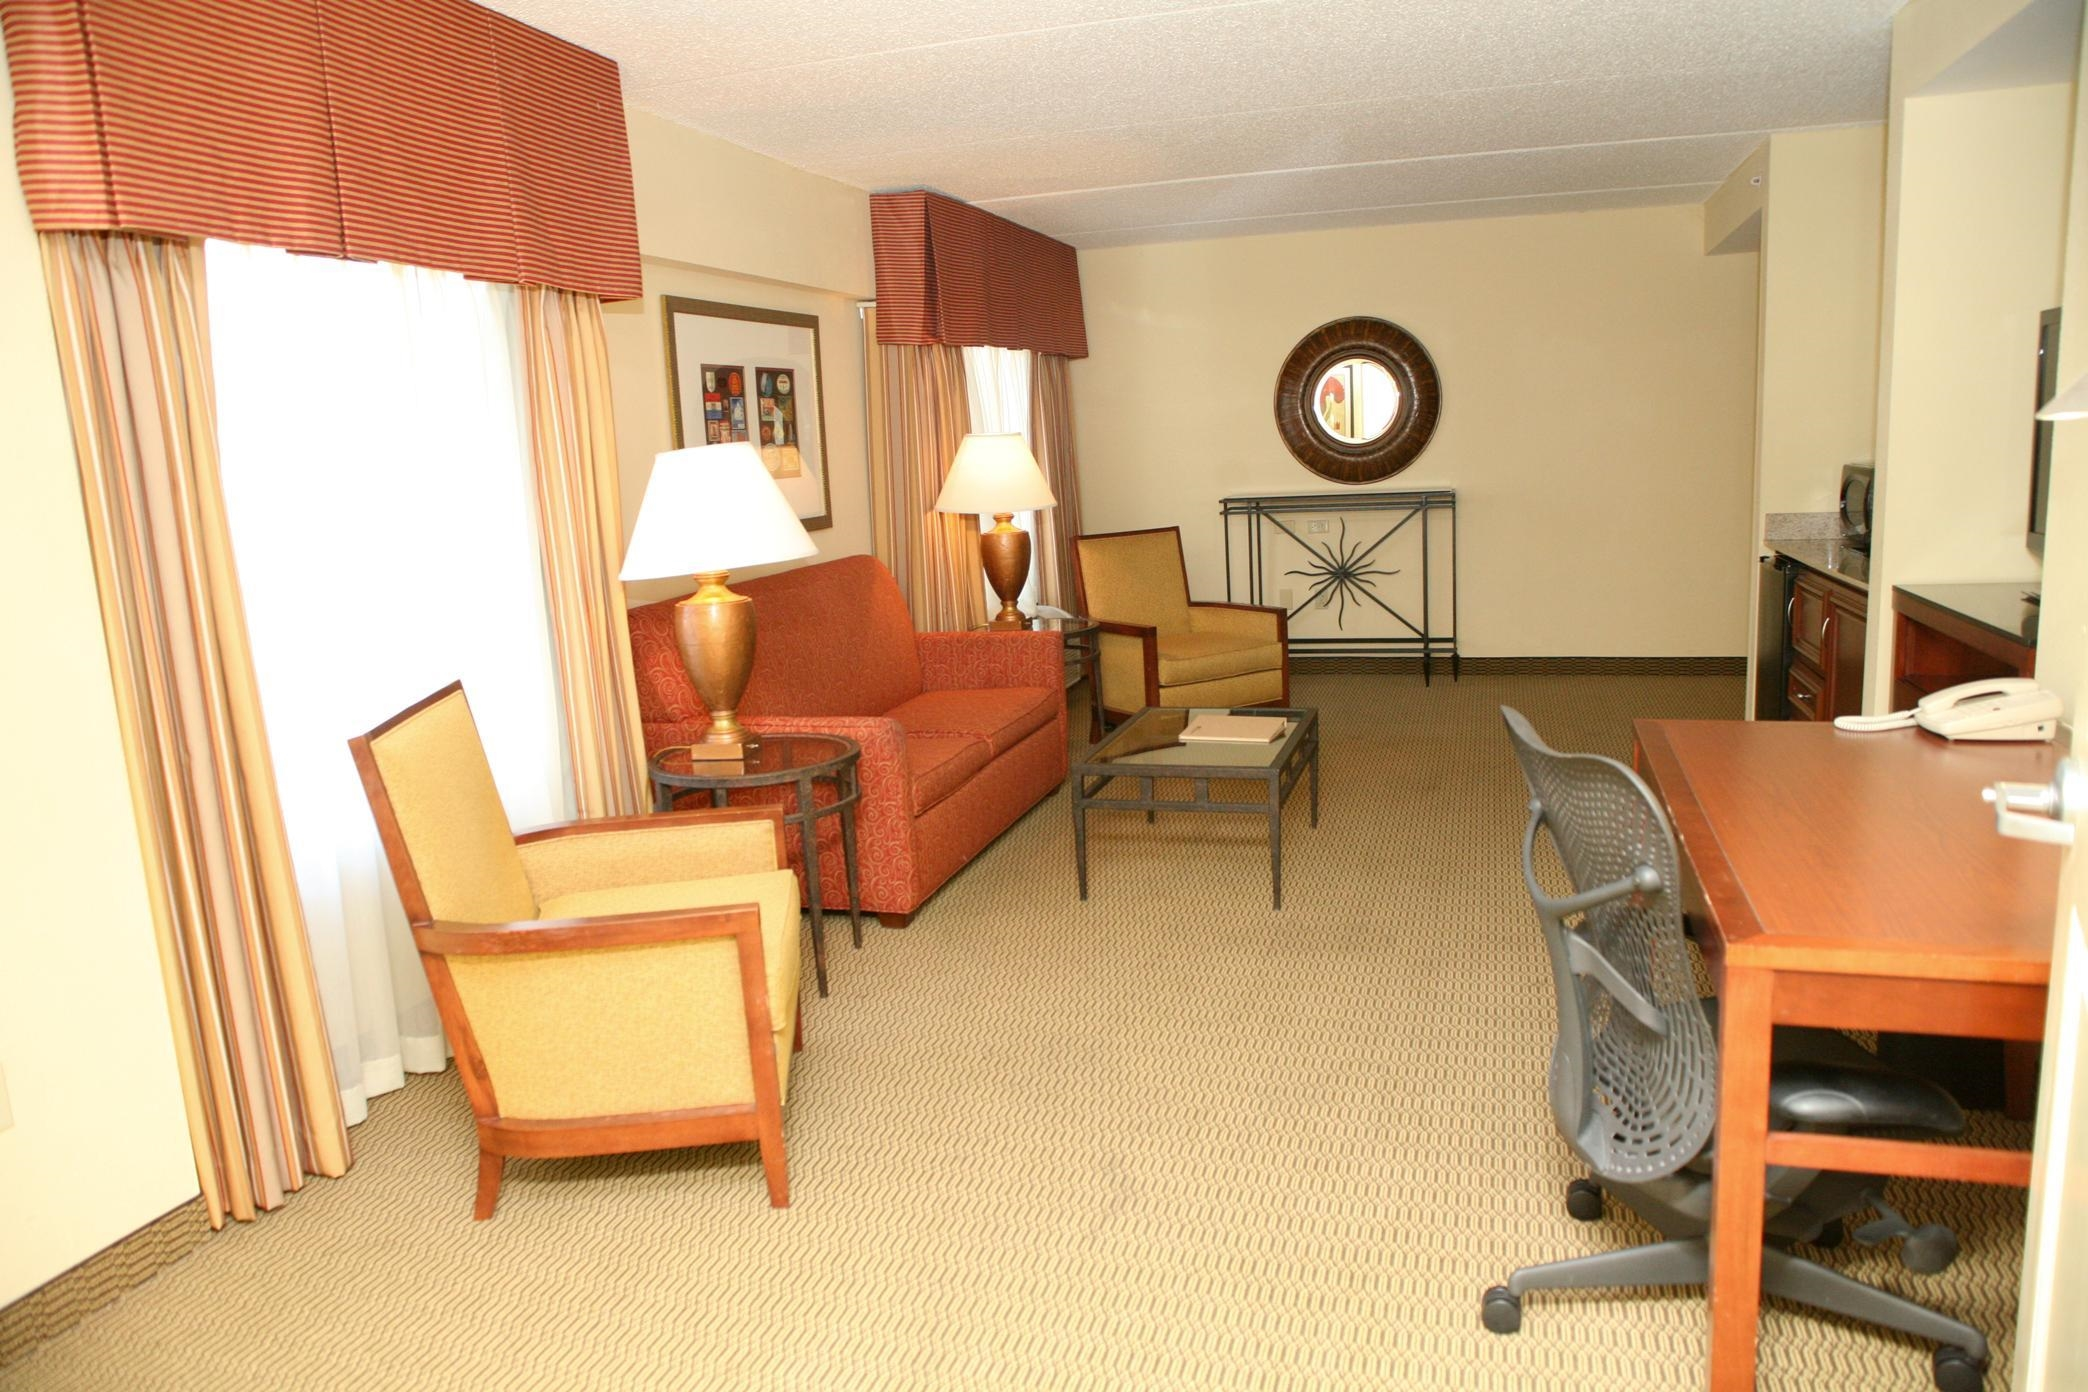 Hilton Garden Inn Terre Haute In Terre Haute In 47807